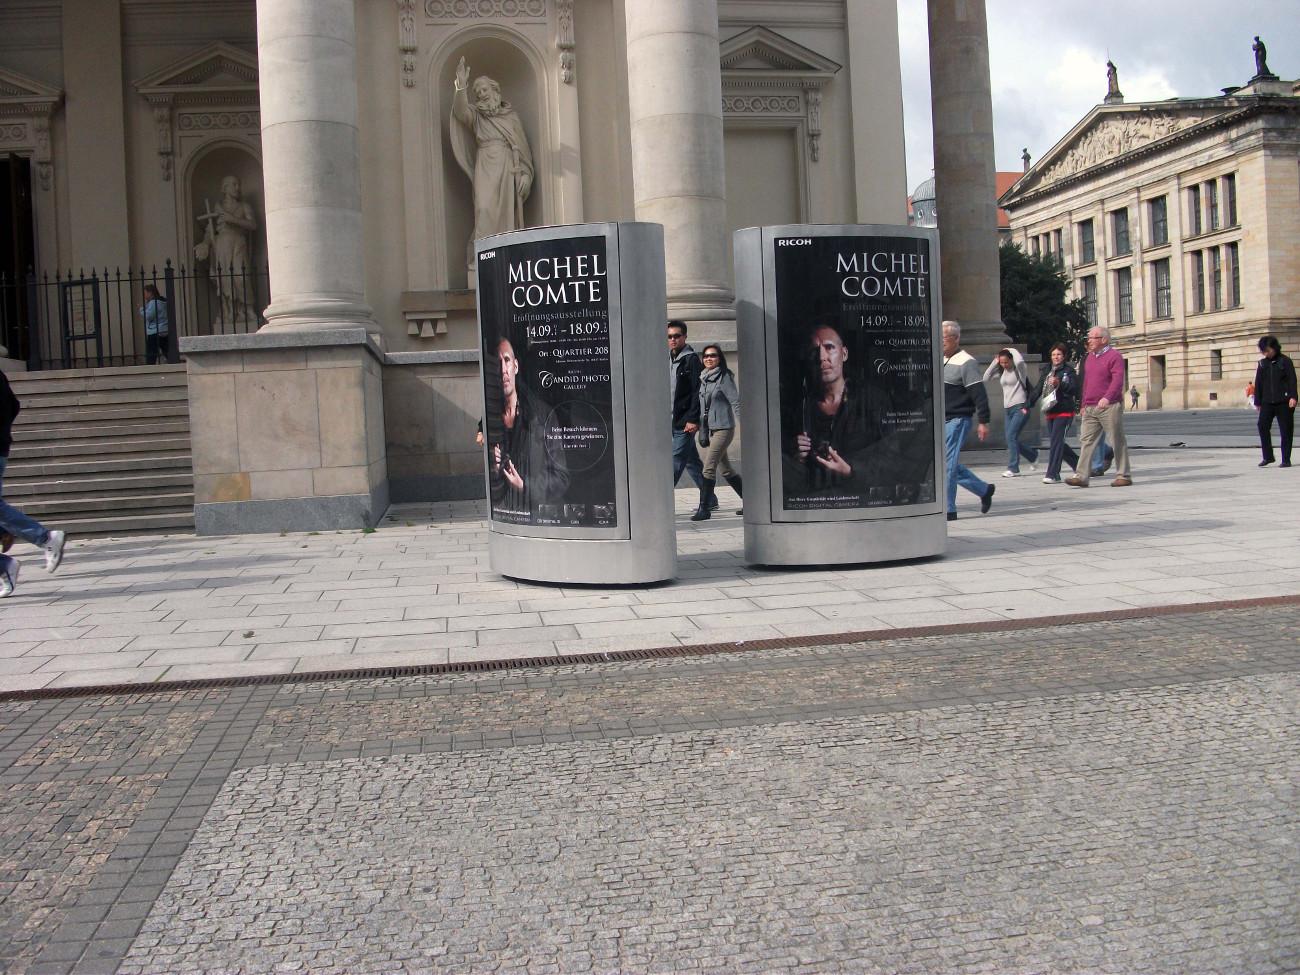 2 Mobile City-Light-Poster viele Passanten gehen am Werbeträger vorbeivisco